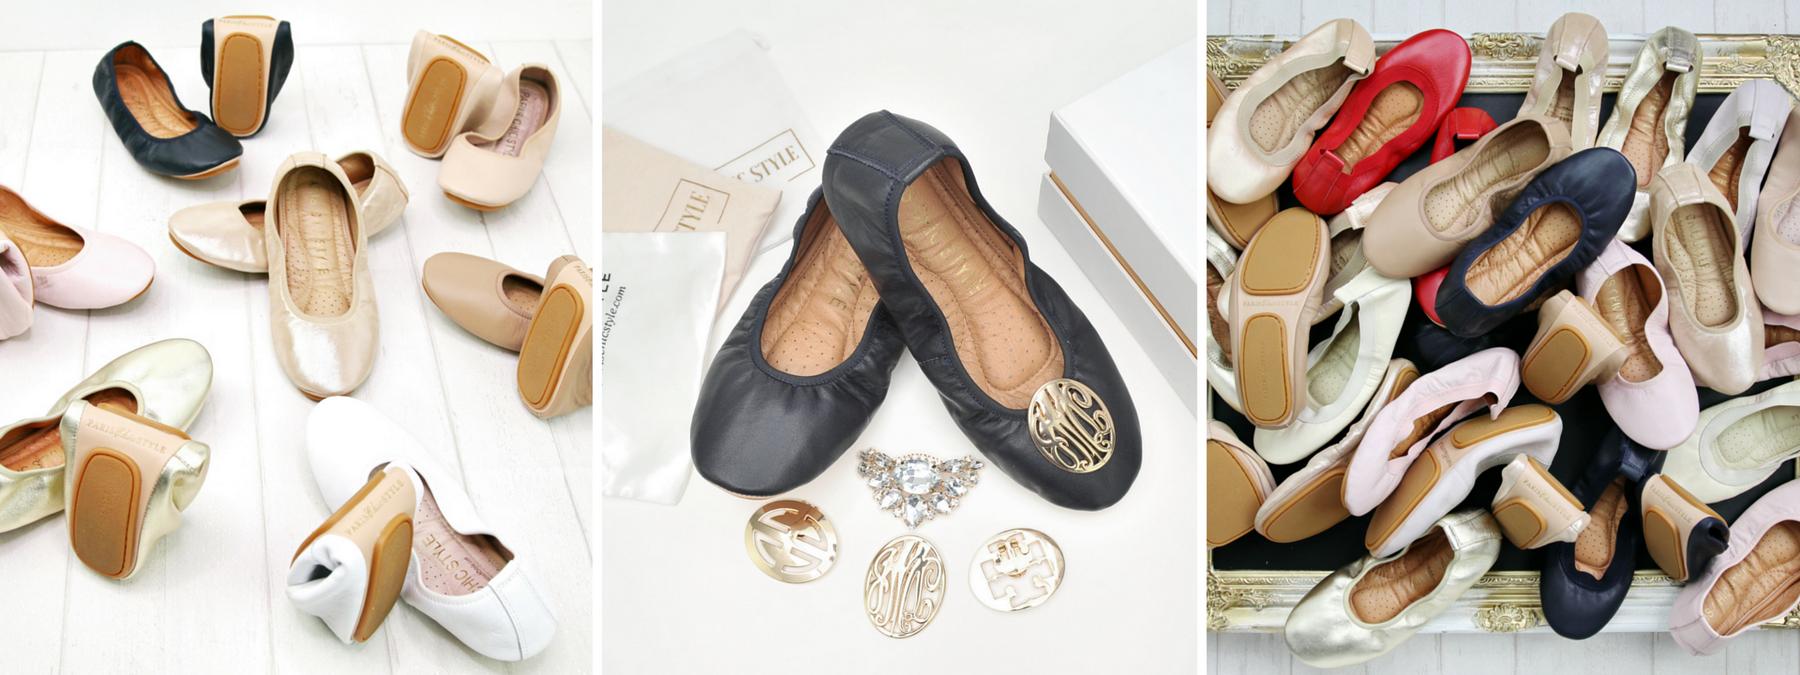 Paris Chic Style Foldable Ballet Flats Kickstarter Email_resize